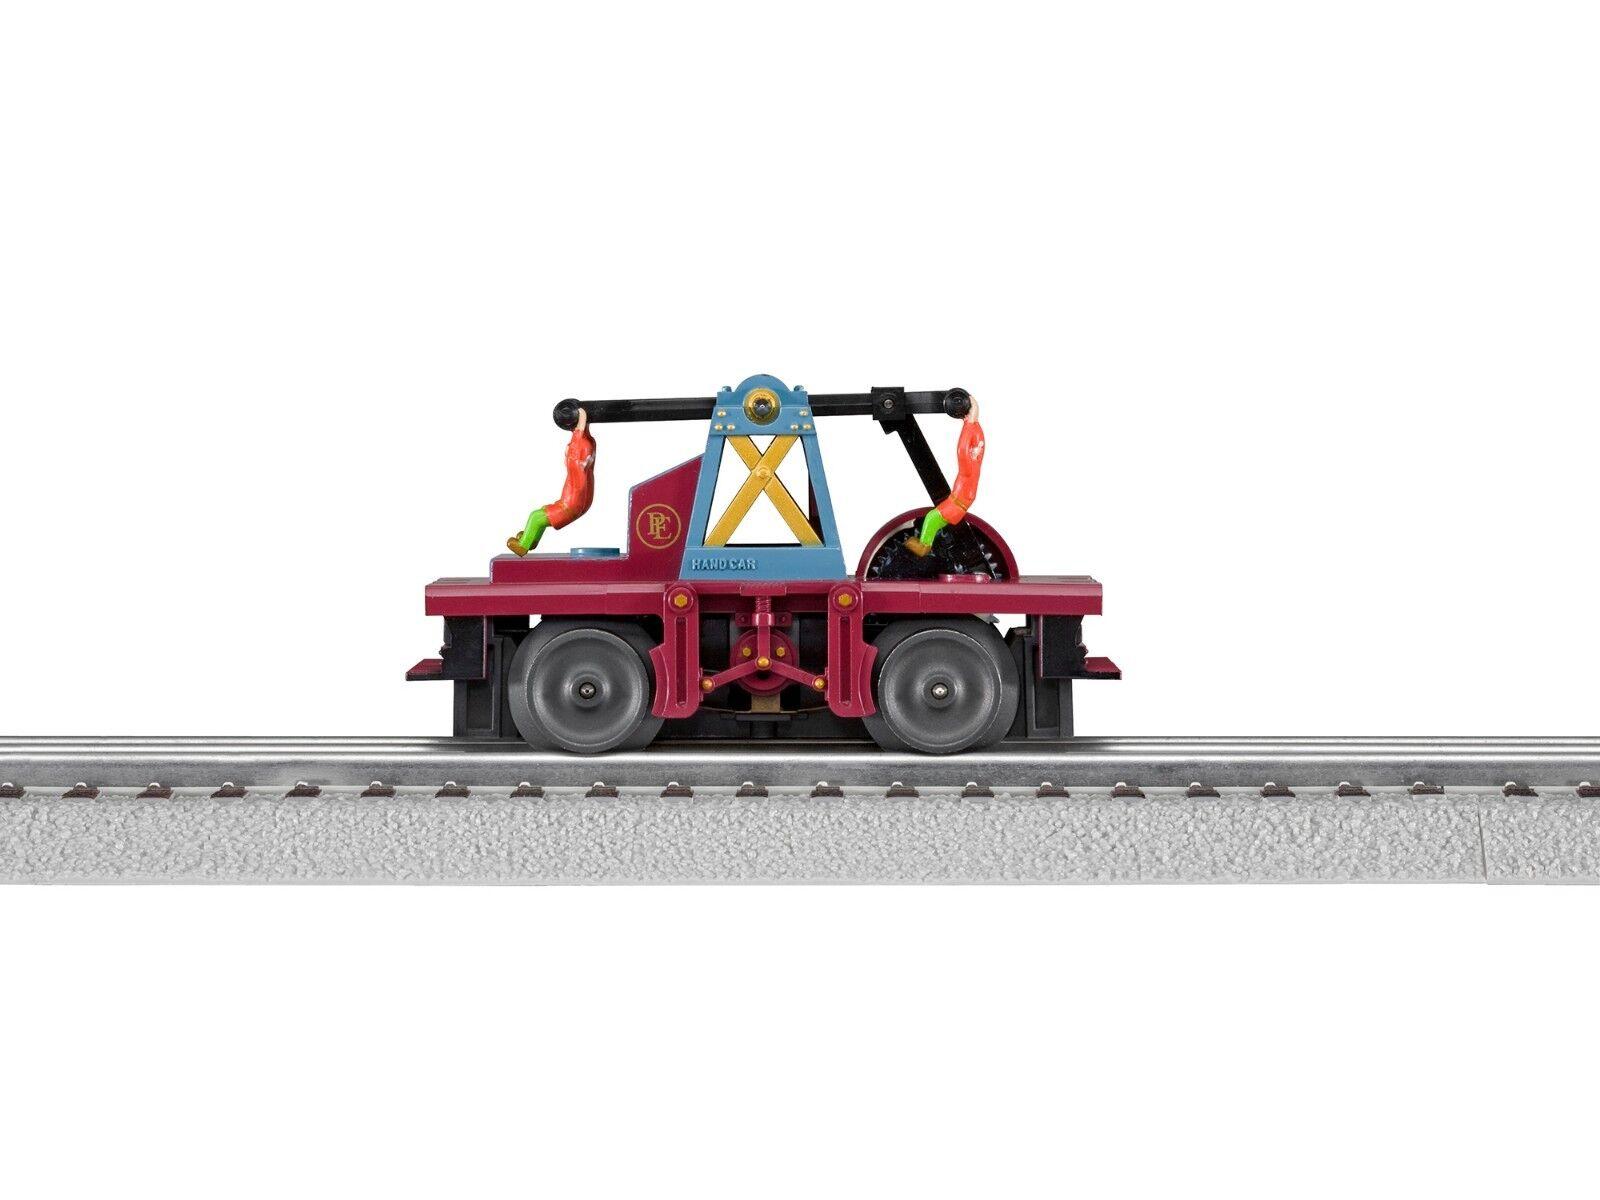 Lionel Trains The Polar Express Elf Handcar O Gauge  LNL6-28425  BRAND NEW